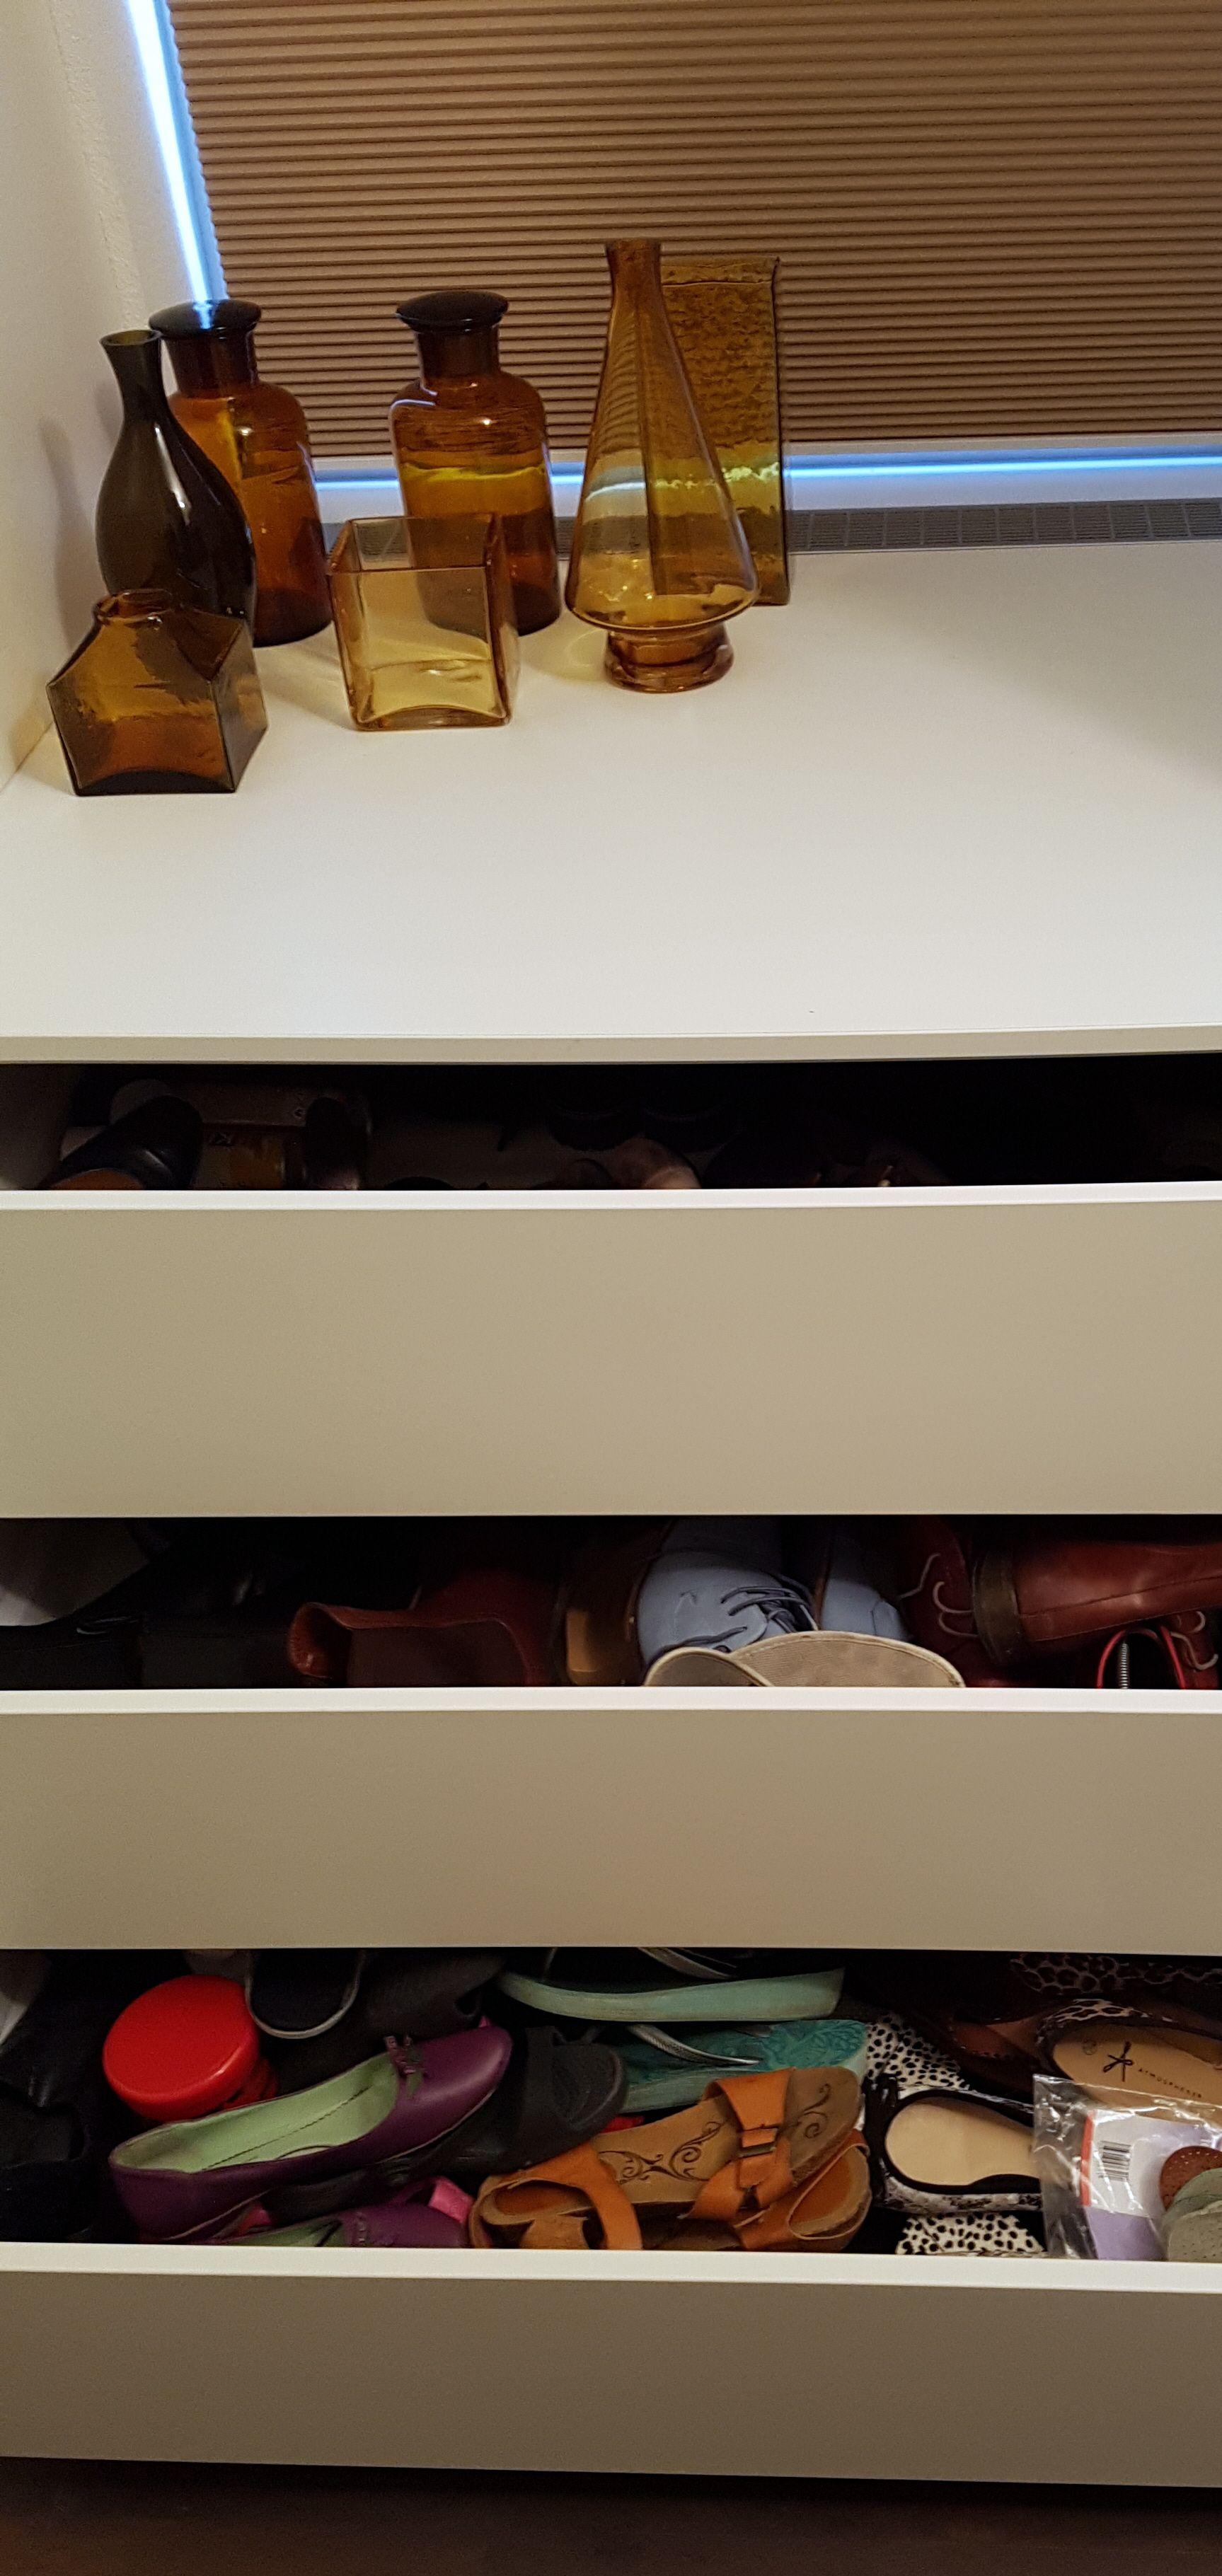 Ladenkast Voor Schoenen.Ladenkast Voor Schoenen Sarkarijobs